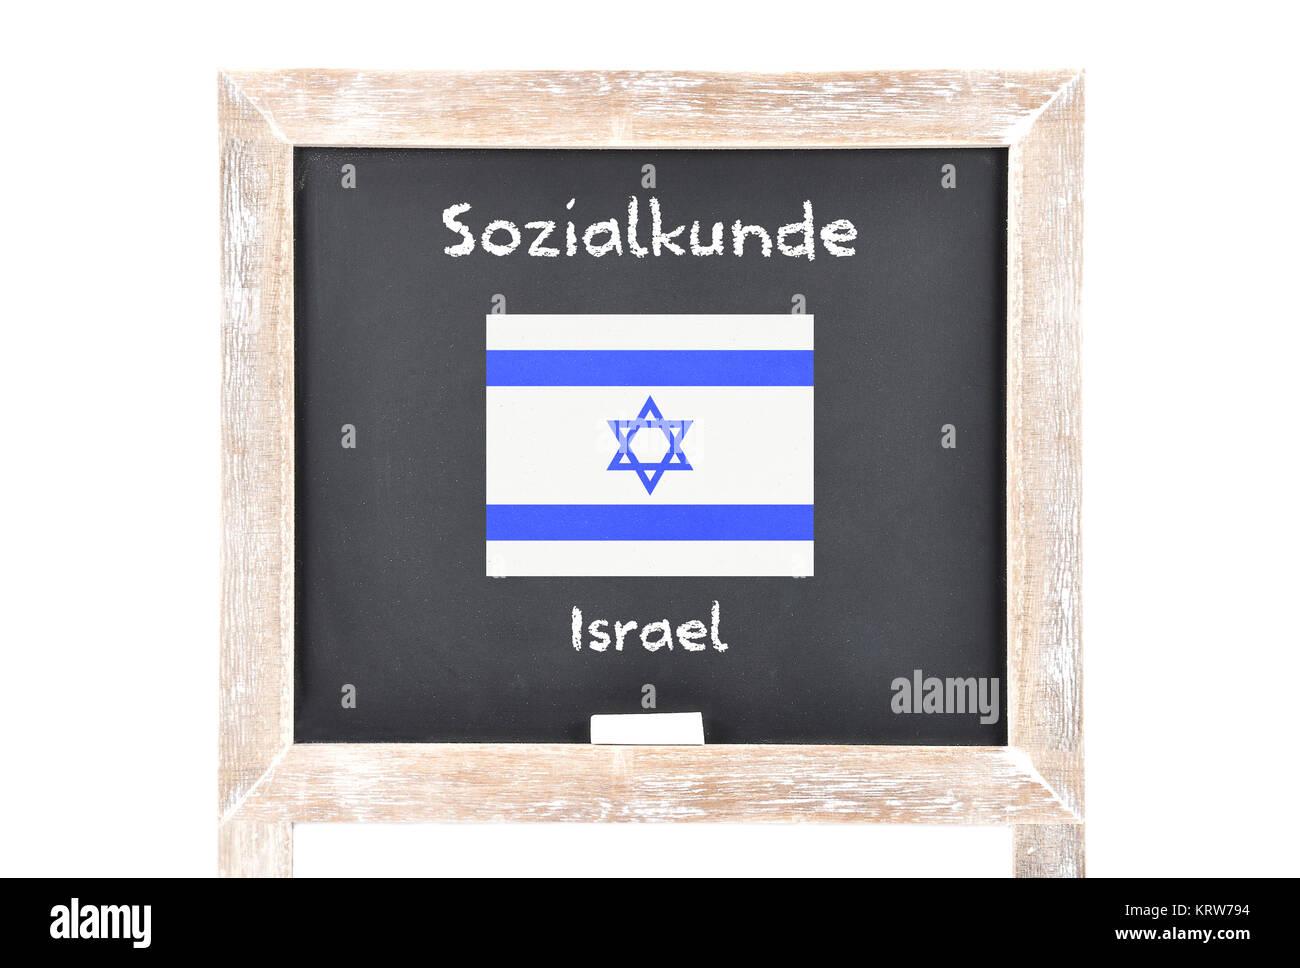 Sozialkunde mit Flagge auf Tafel - Stock Image